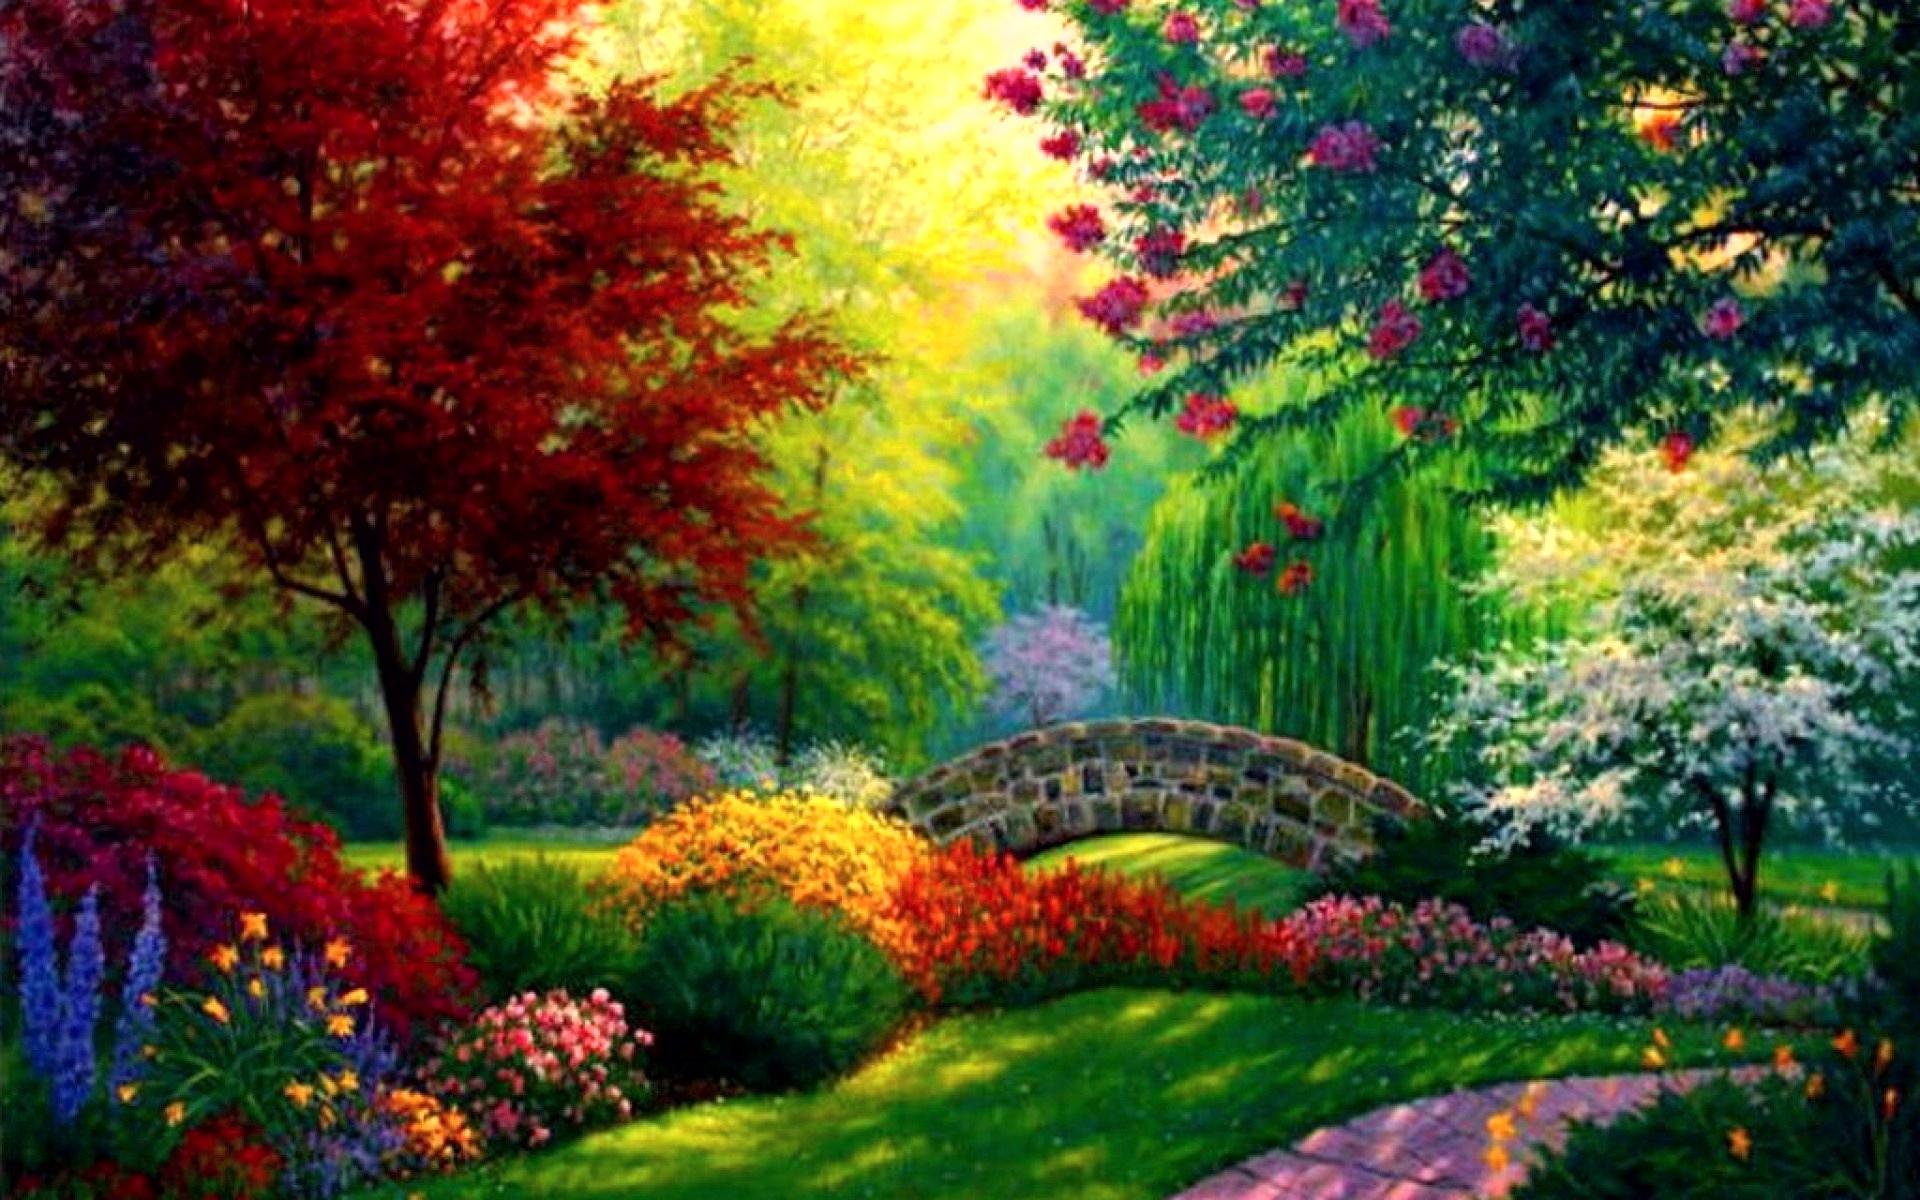 Free Download Beautiful Nature Hd Wallpapers For Desktop